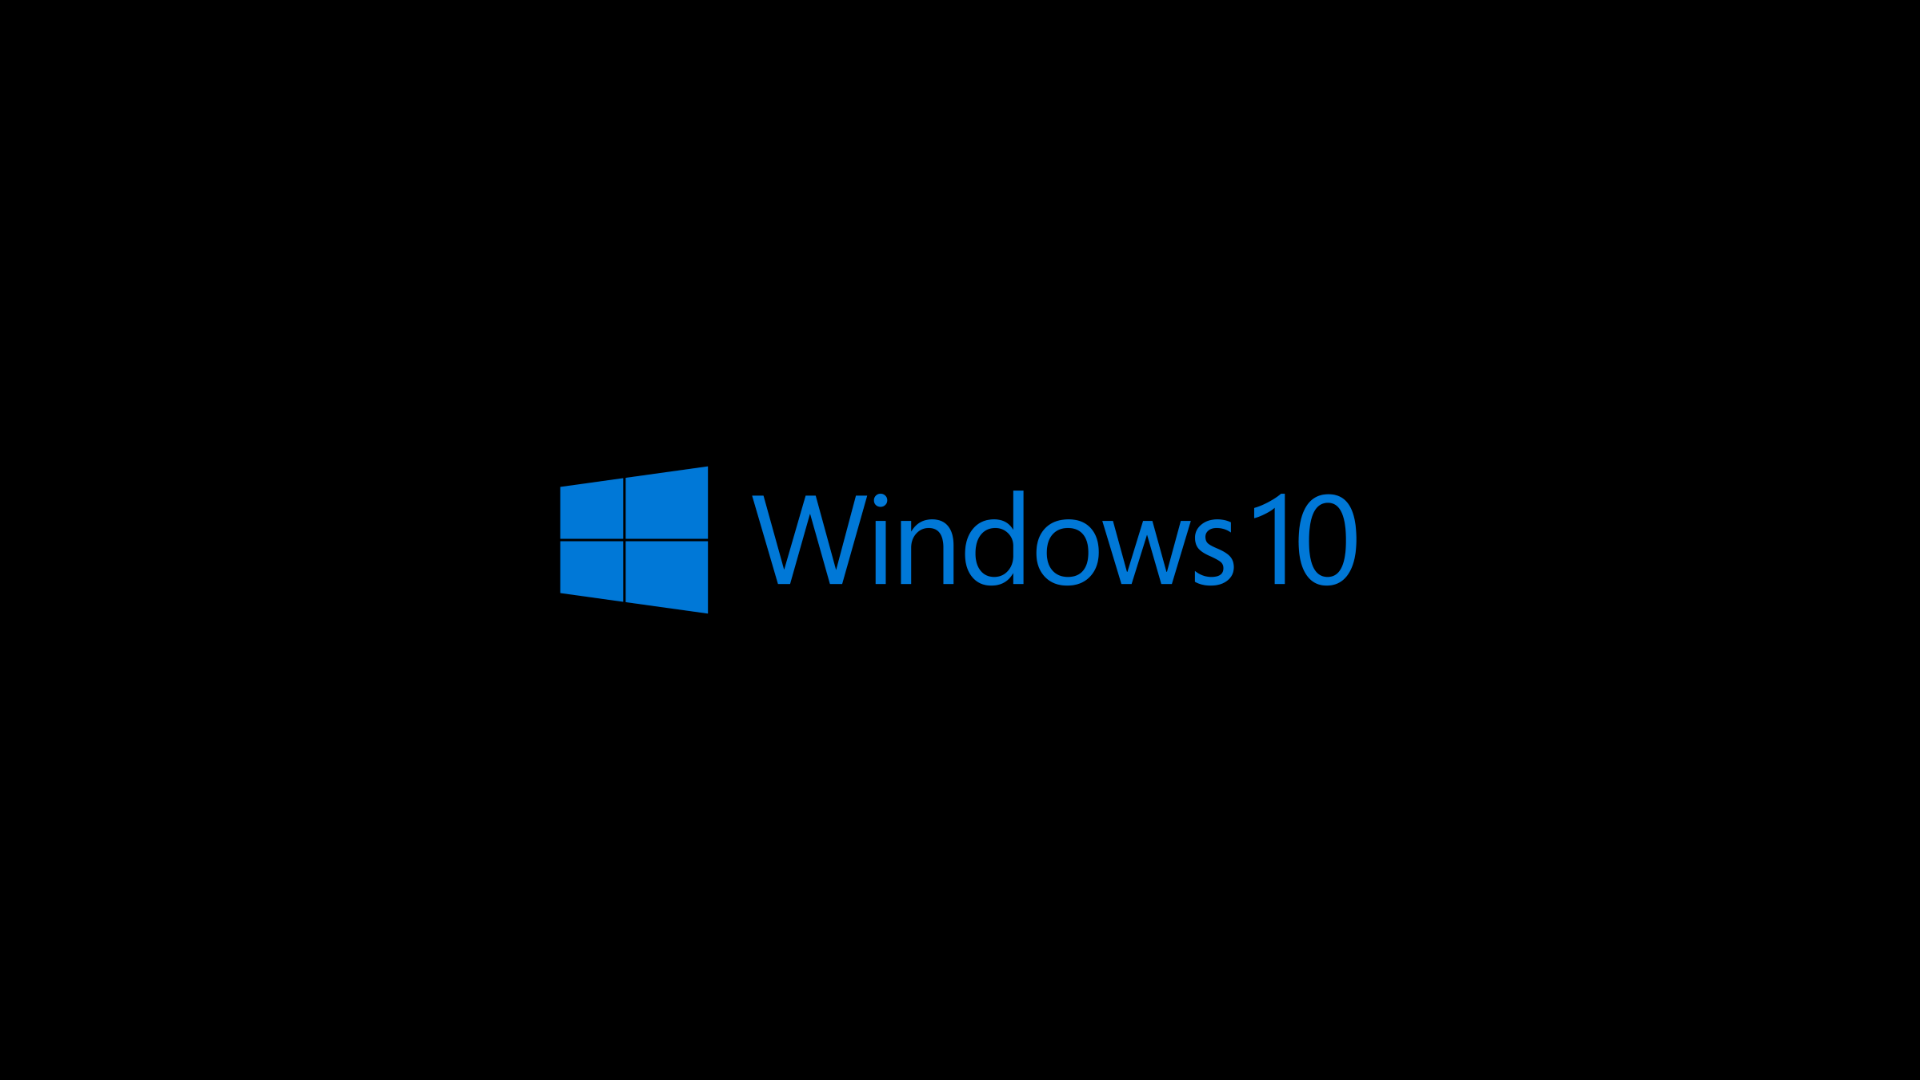 Basic Windows 10 wallpaper